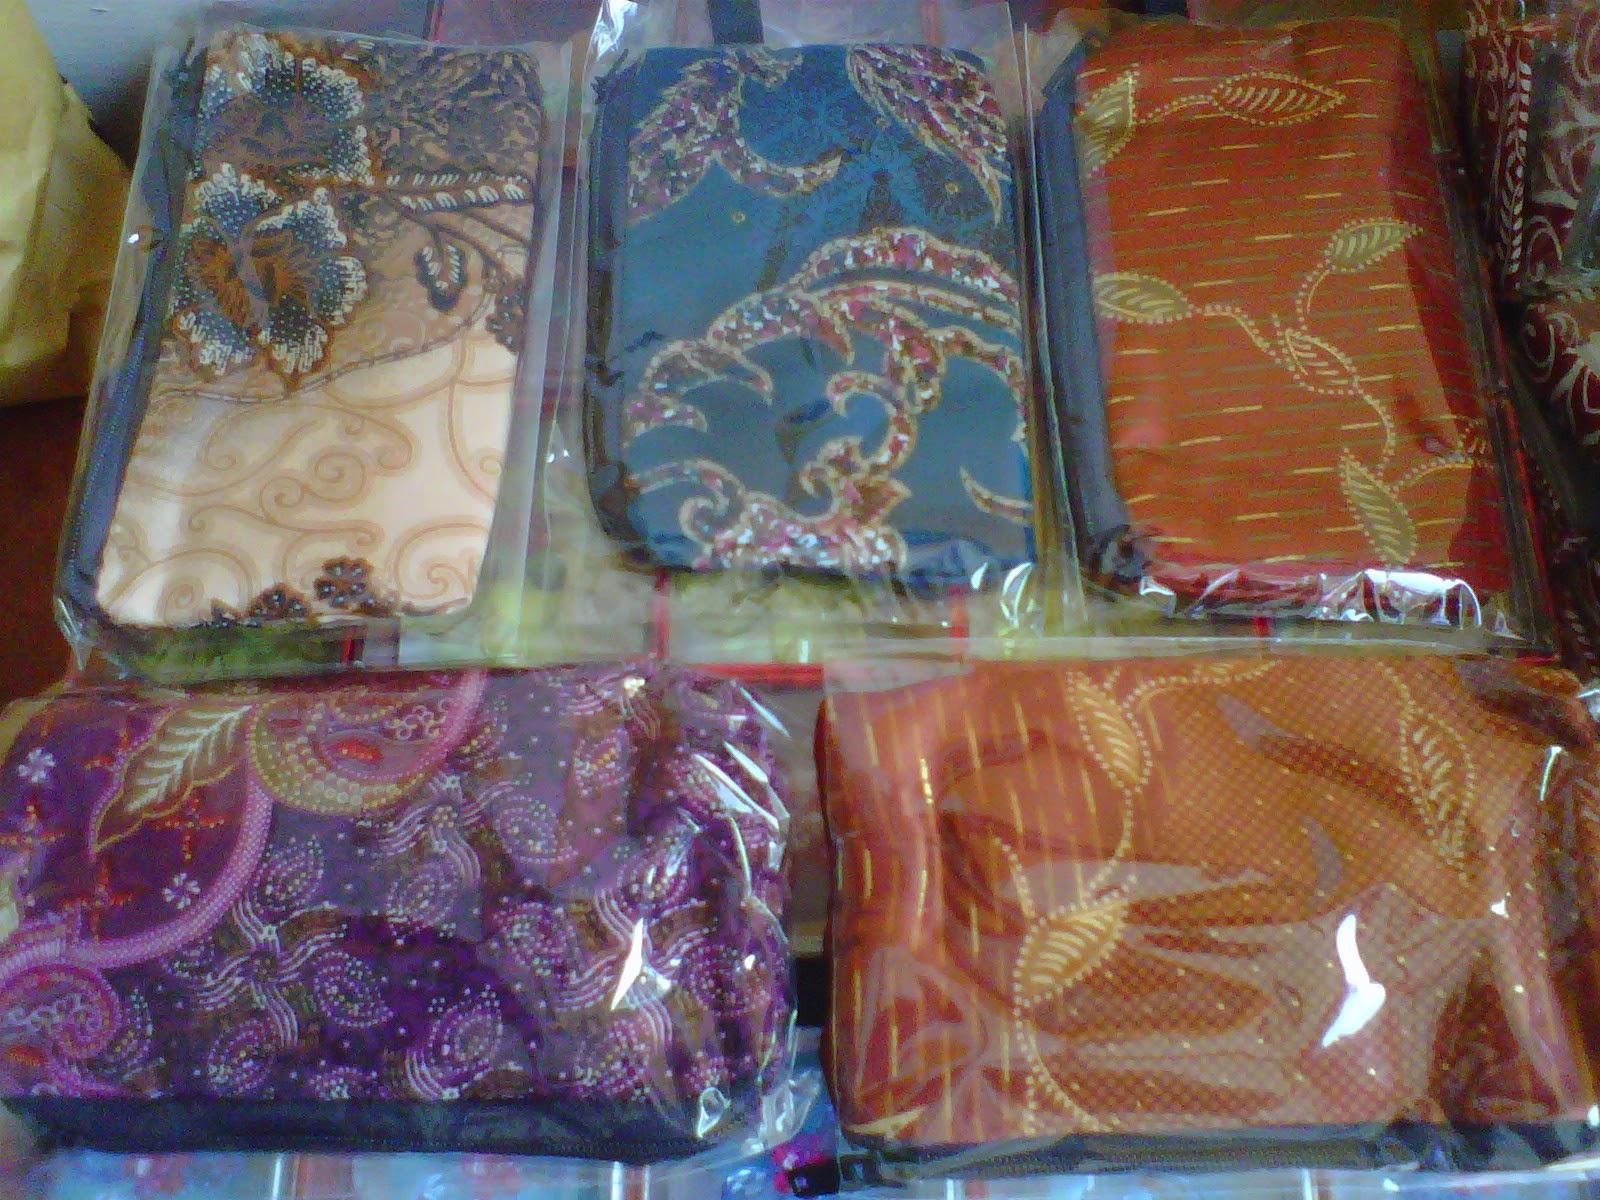 souvenir dompet,souvenir dompet murah,souvenir dompet batik,souvenir dompet hp.